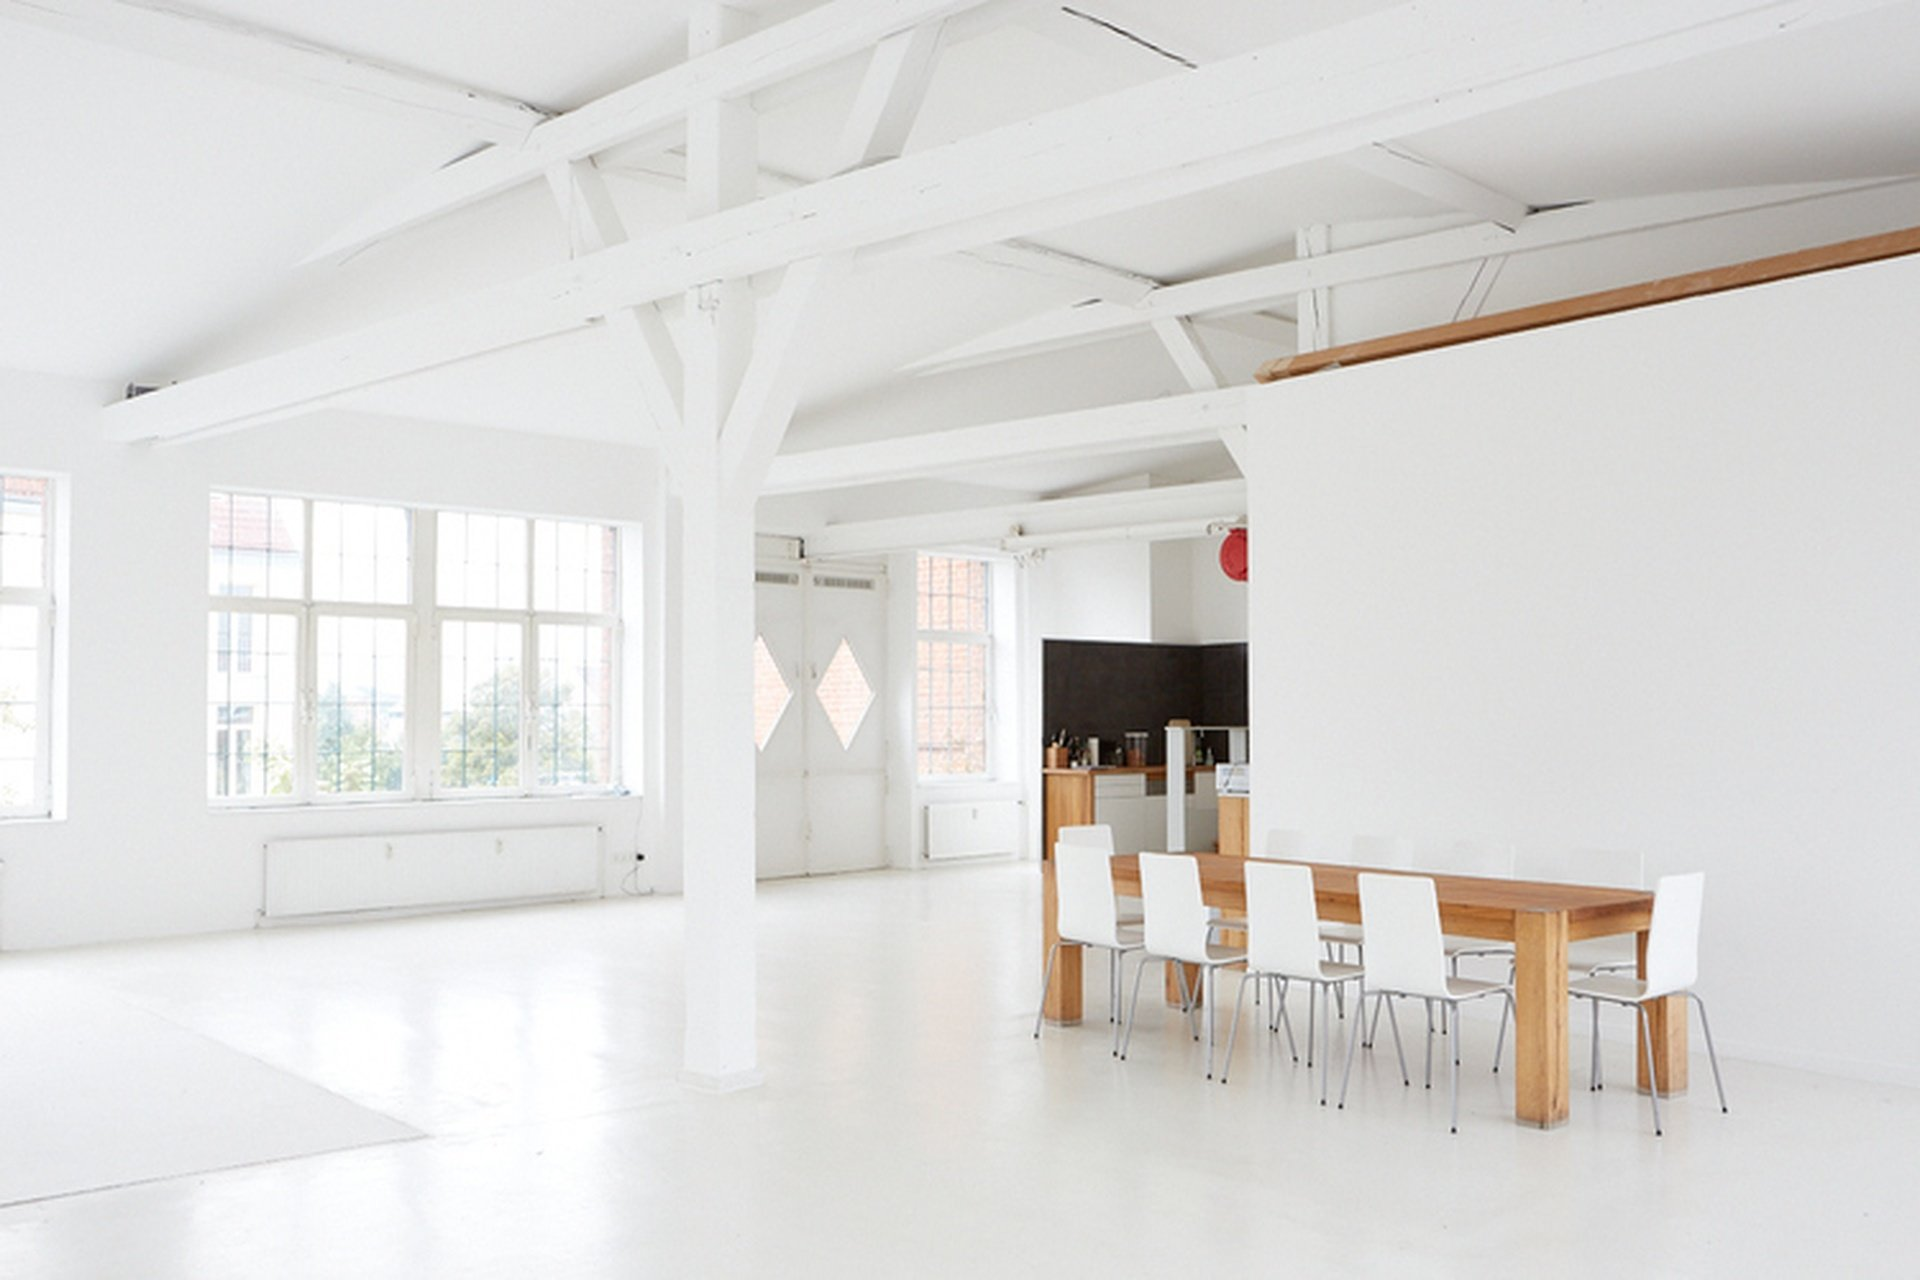 Hamburg workshop spaces Photography studio Highnoon Studio - East image 0